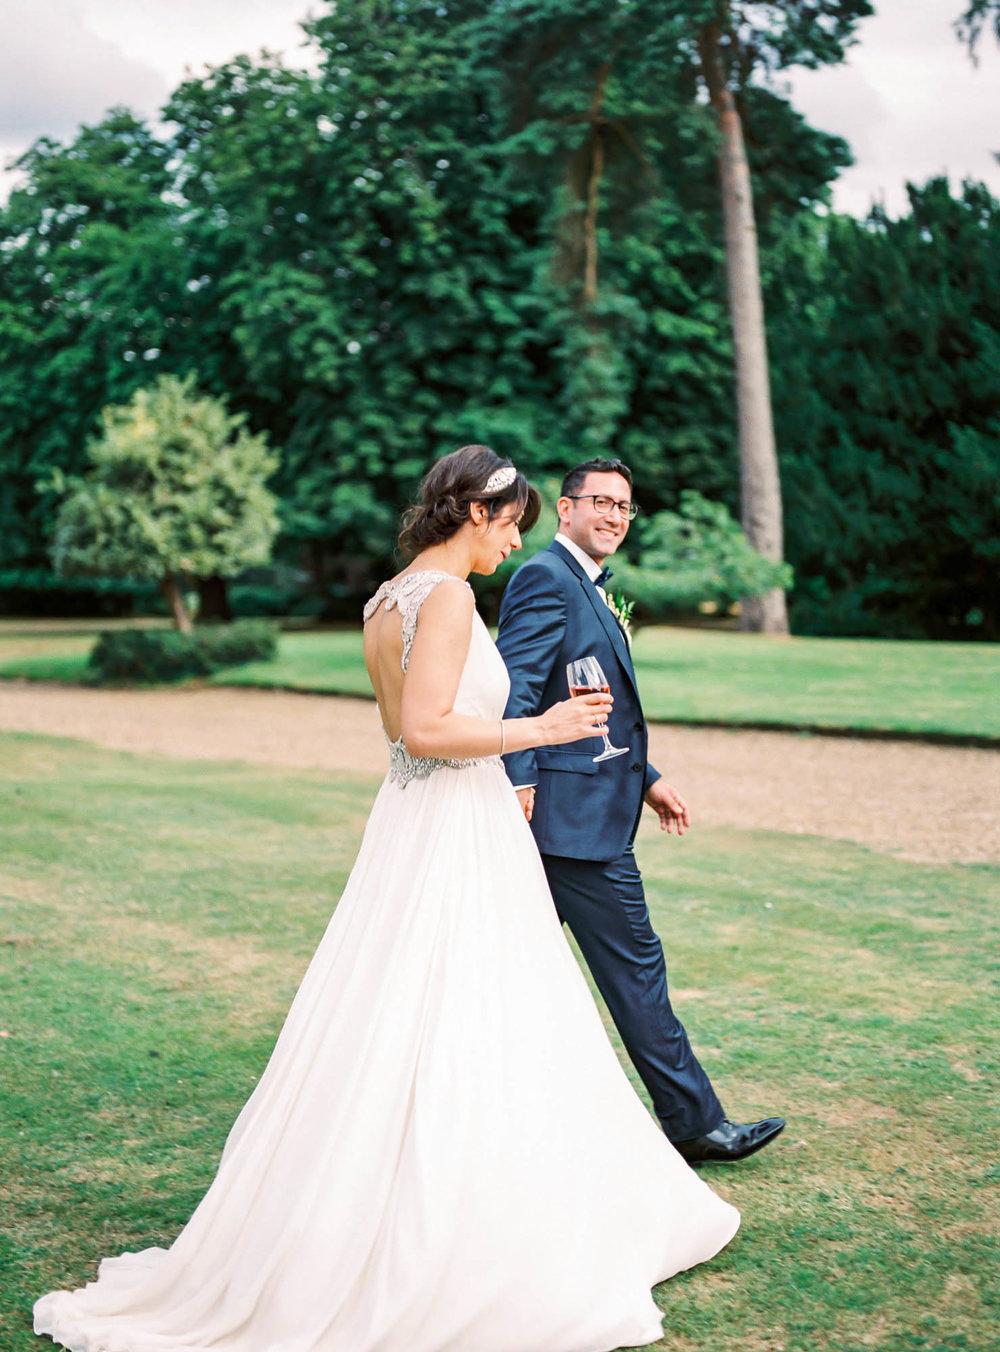 Amy O'Boyle Photography- Destination & UK Fine Art Film Wedding Photographer- Brickendonbury Estate Wedding-24.jpg